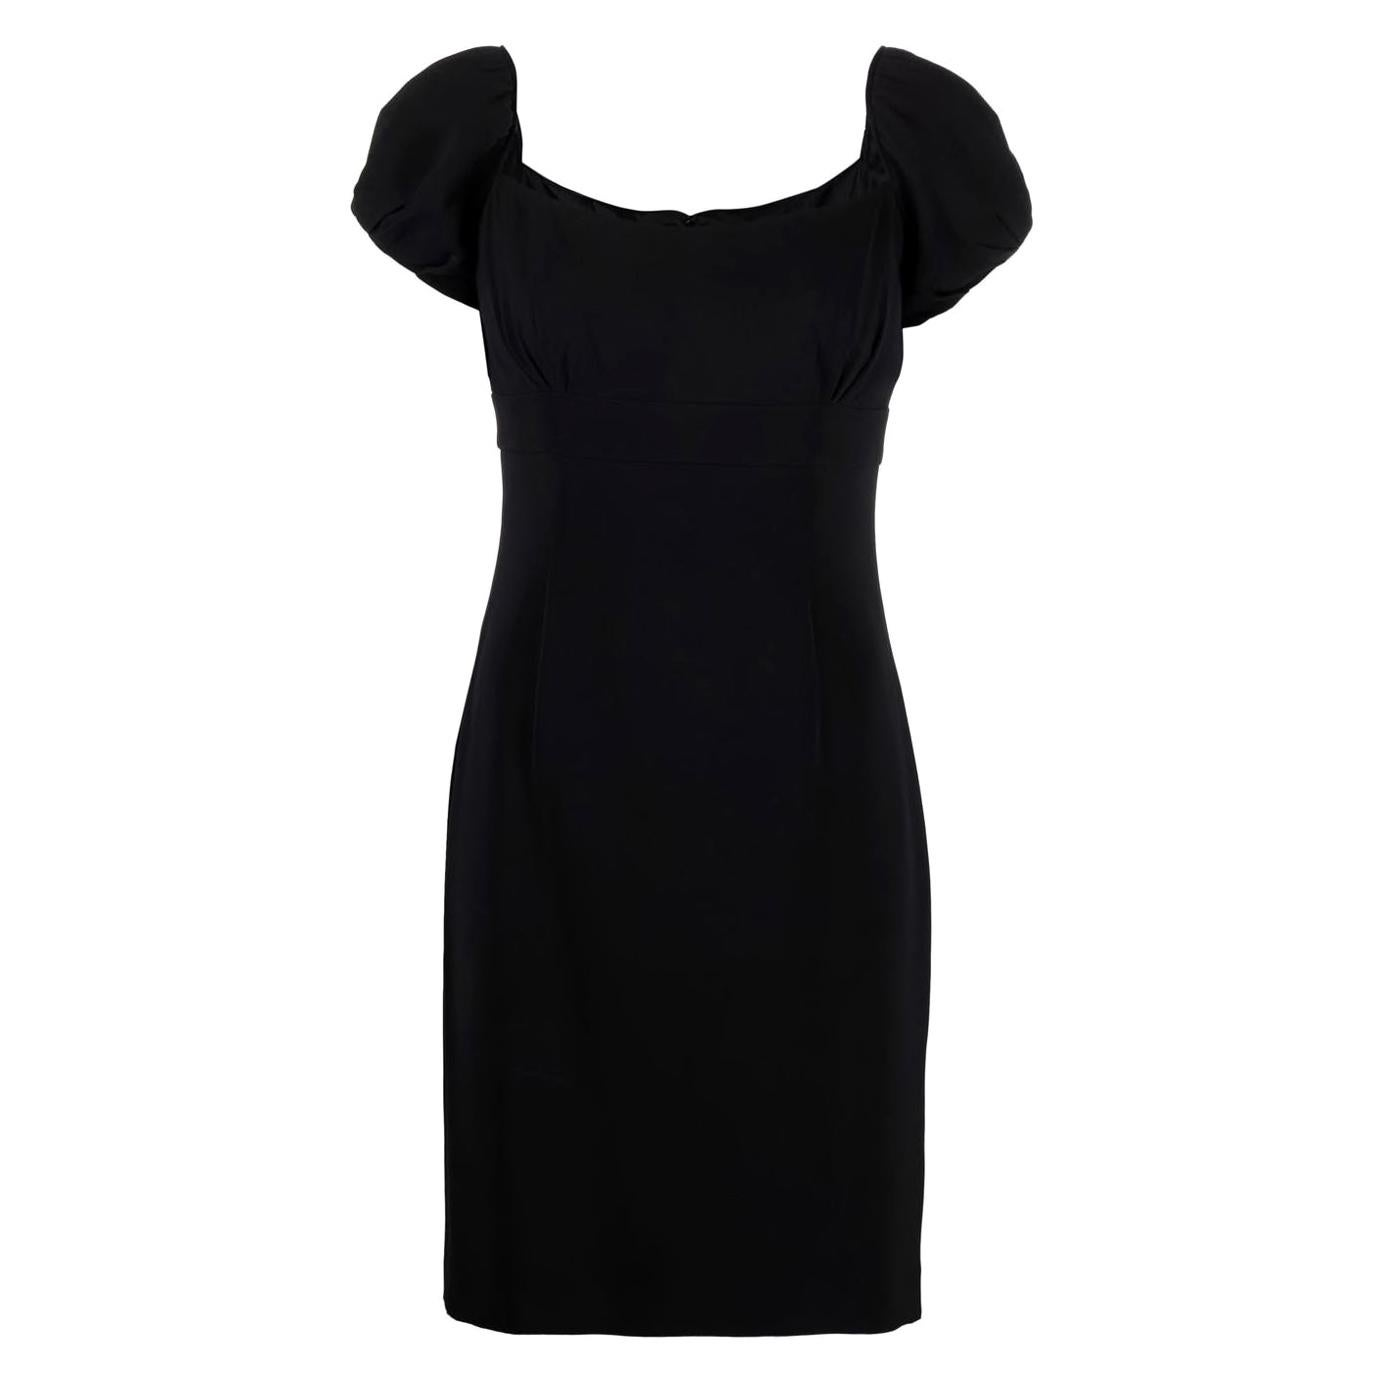 1990s Christian Dior Black Silk Cocktail Dress